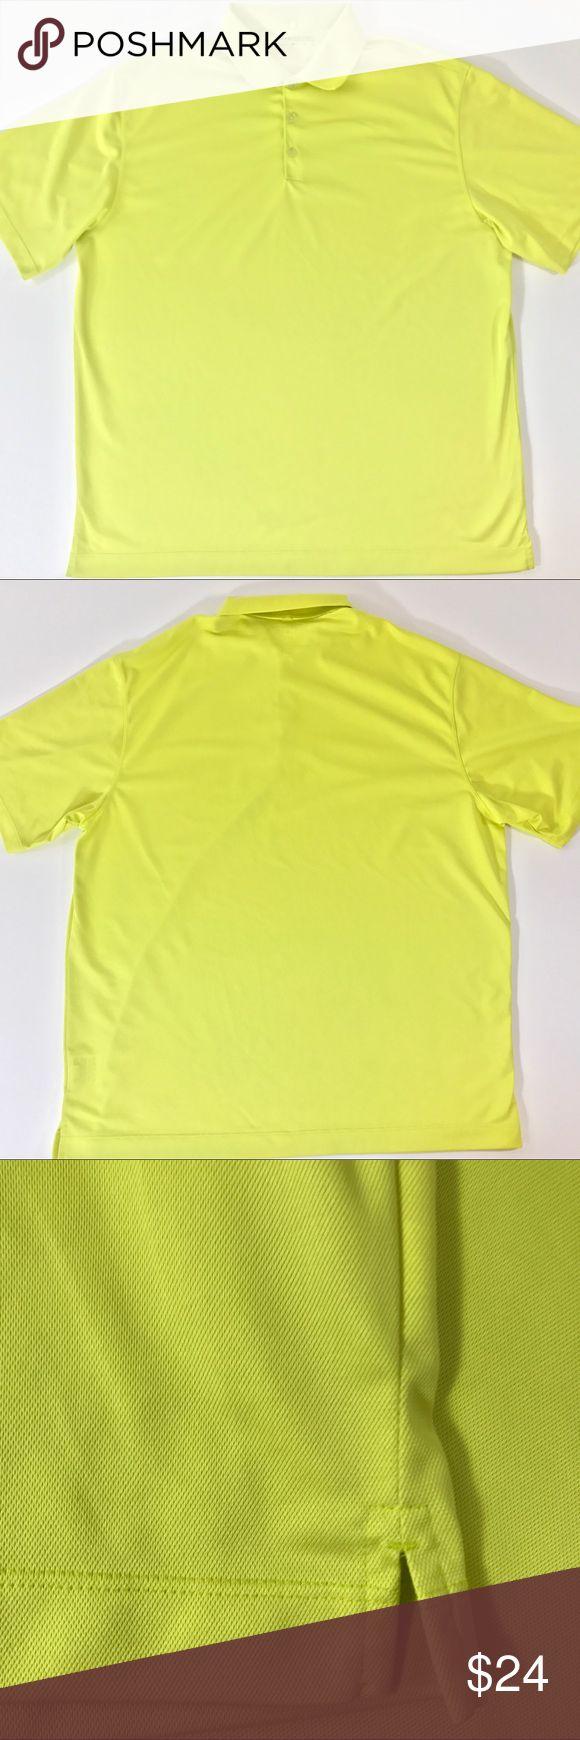 Shirt design measurements - Men S Nike Dri Fit Golf Polo Shirt Yellow Size Xl